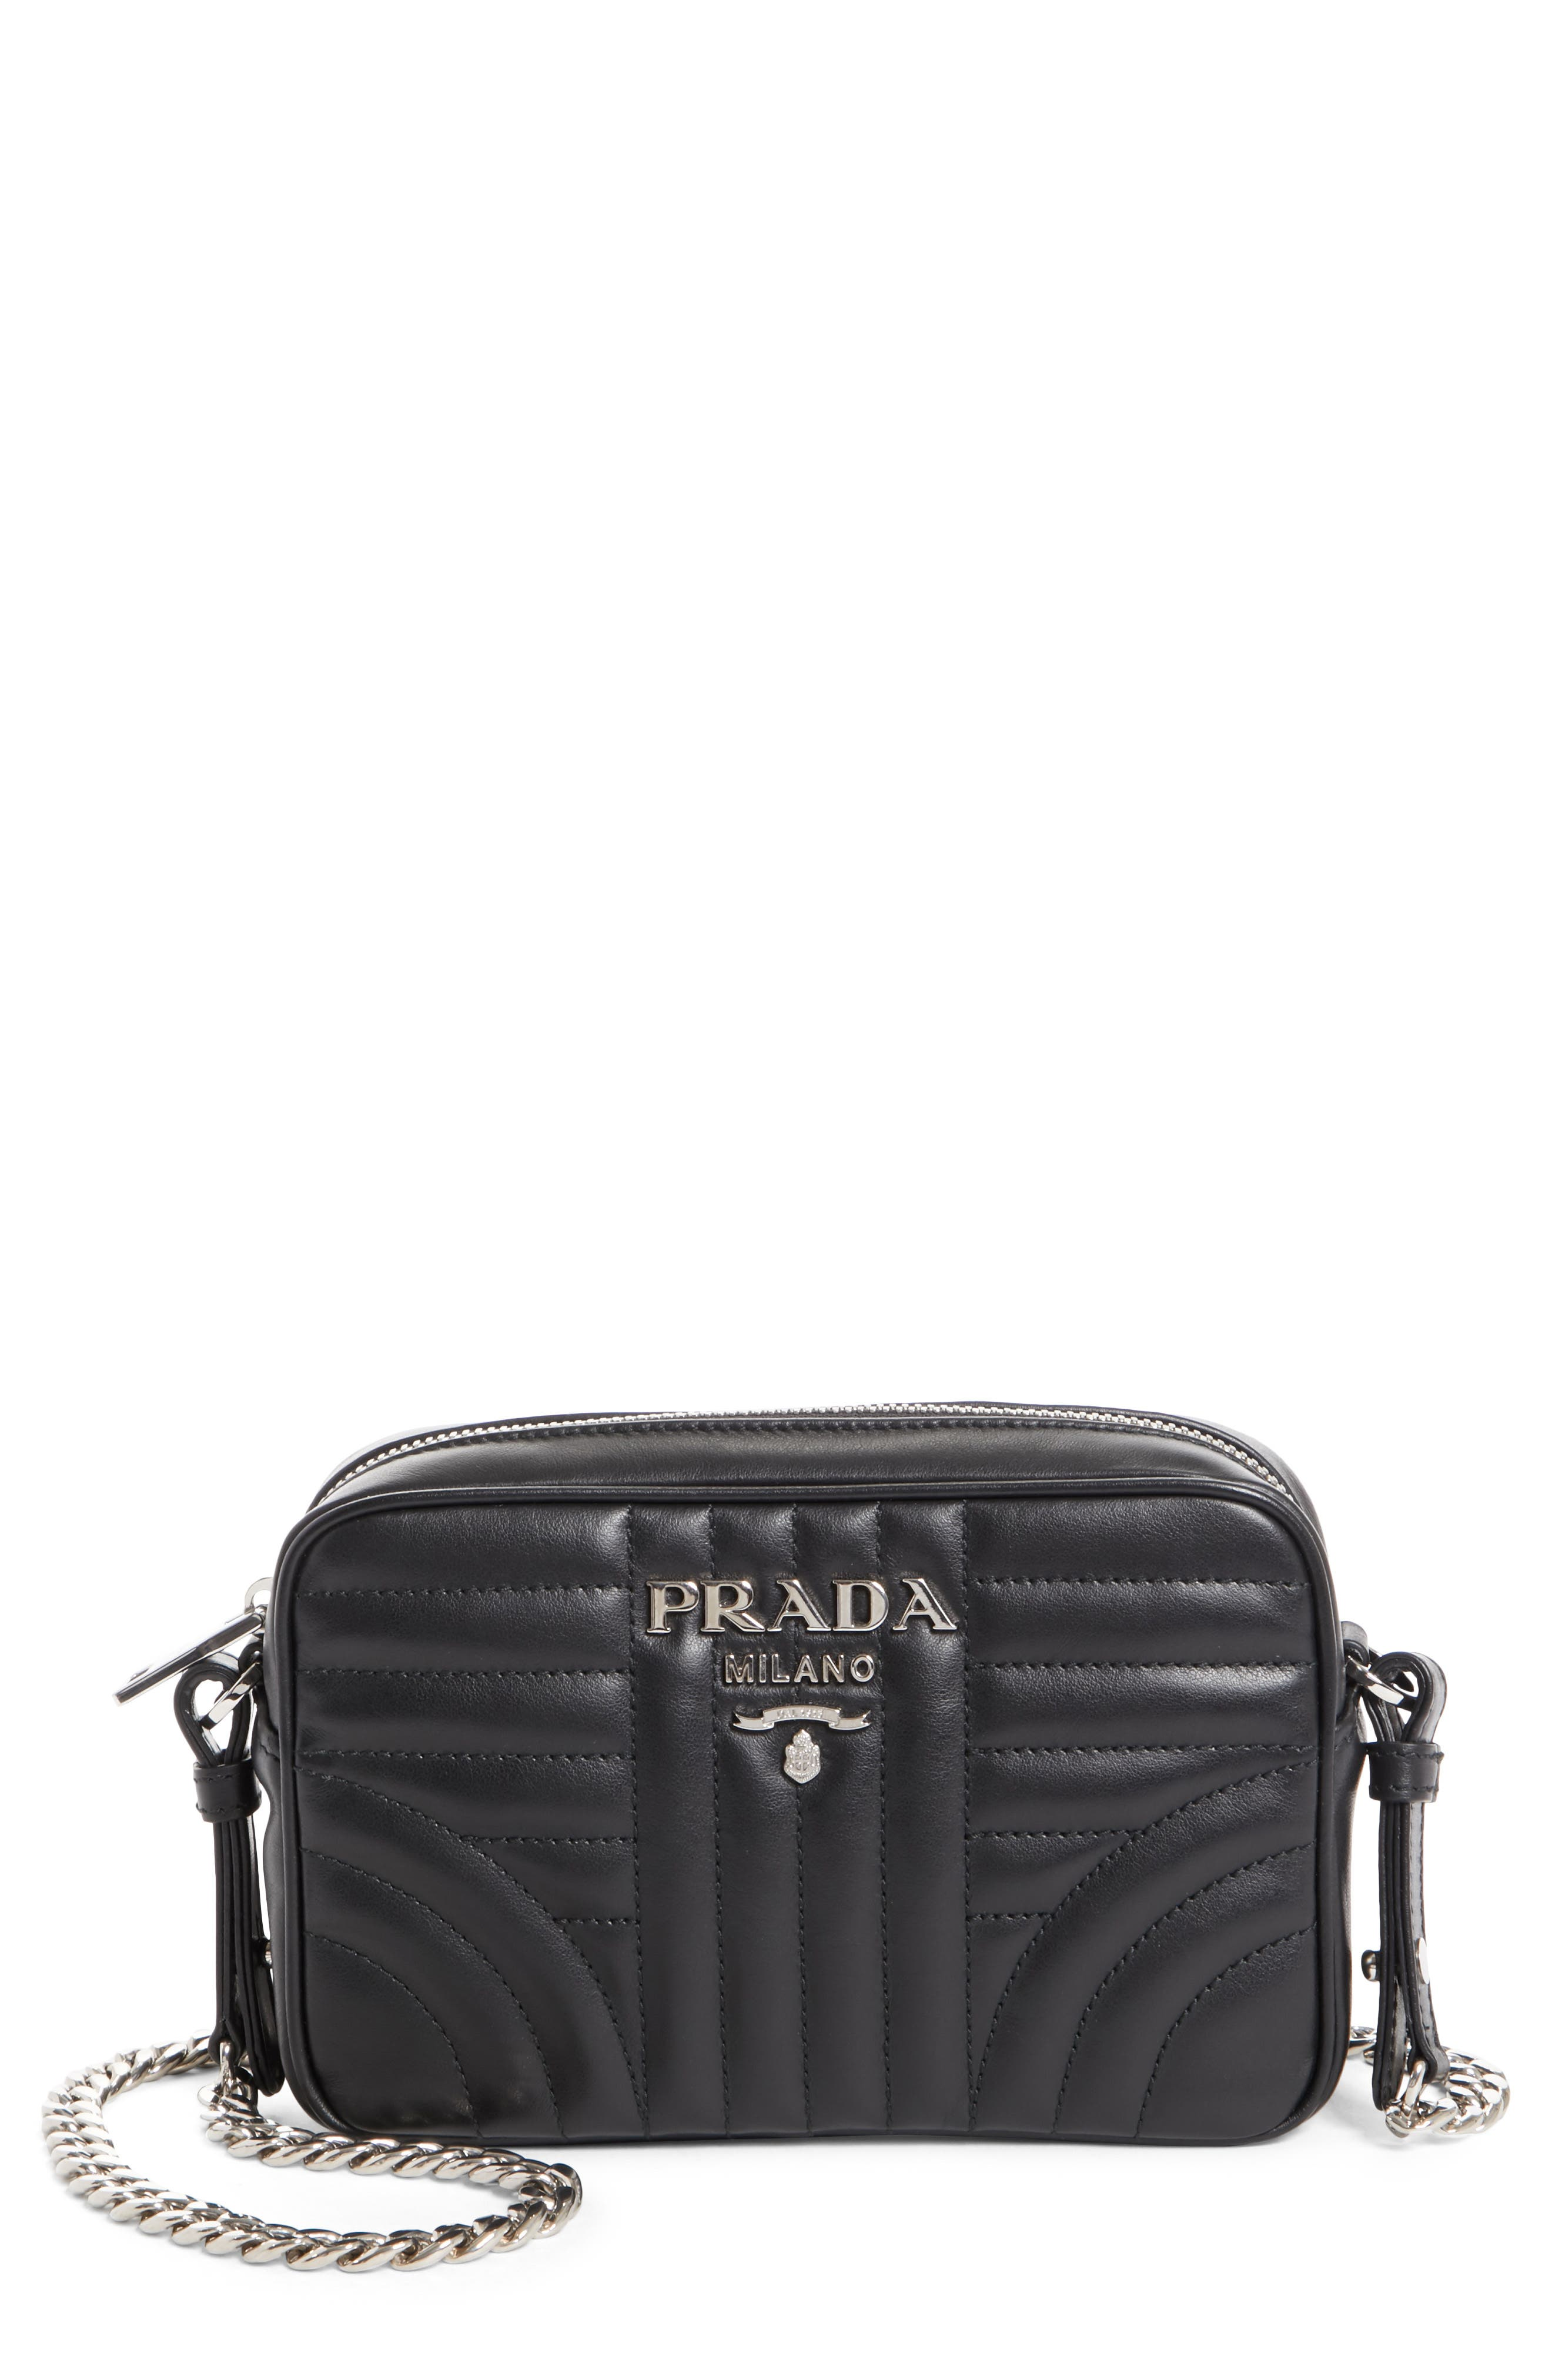 Prada Small Impunture Quilted Calfskin Leather Camera Bag